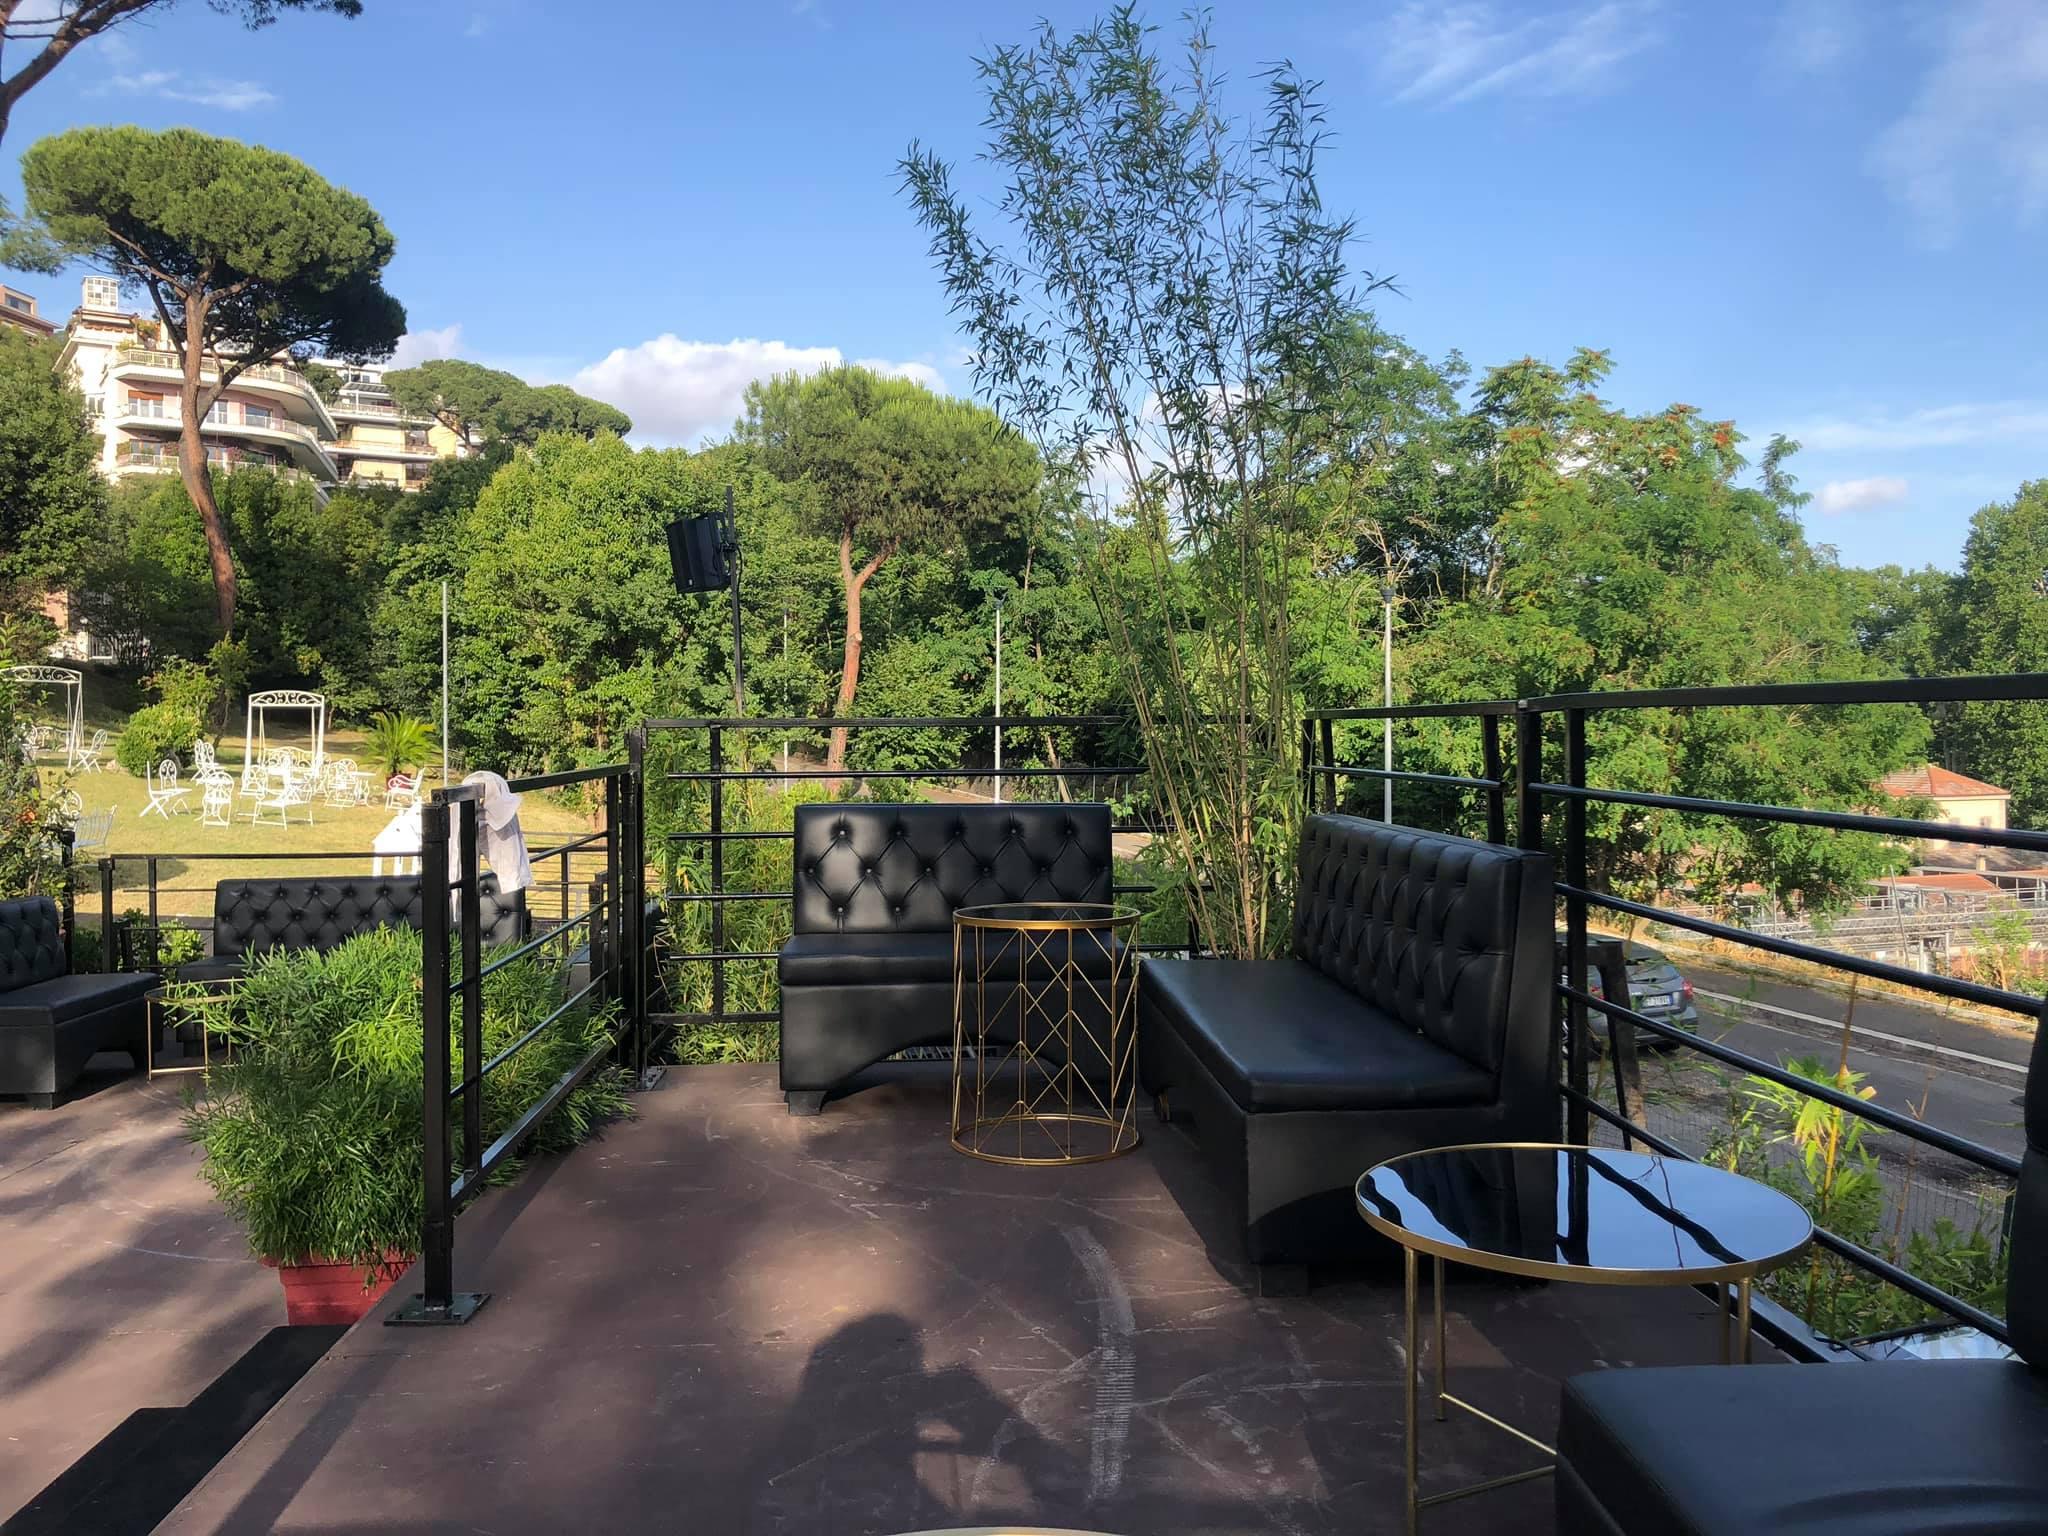 La Villa Roma sabato 13 giugno 2020 Aperitivo Cena Roof Garden